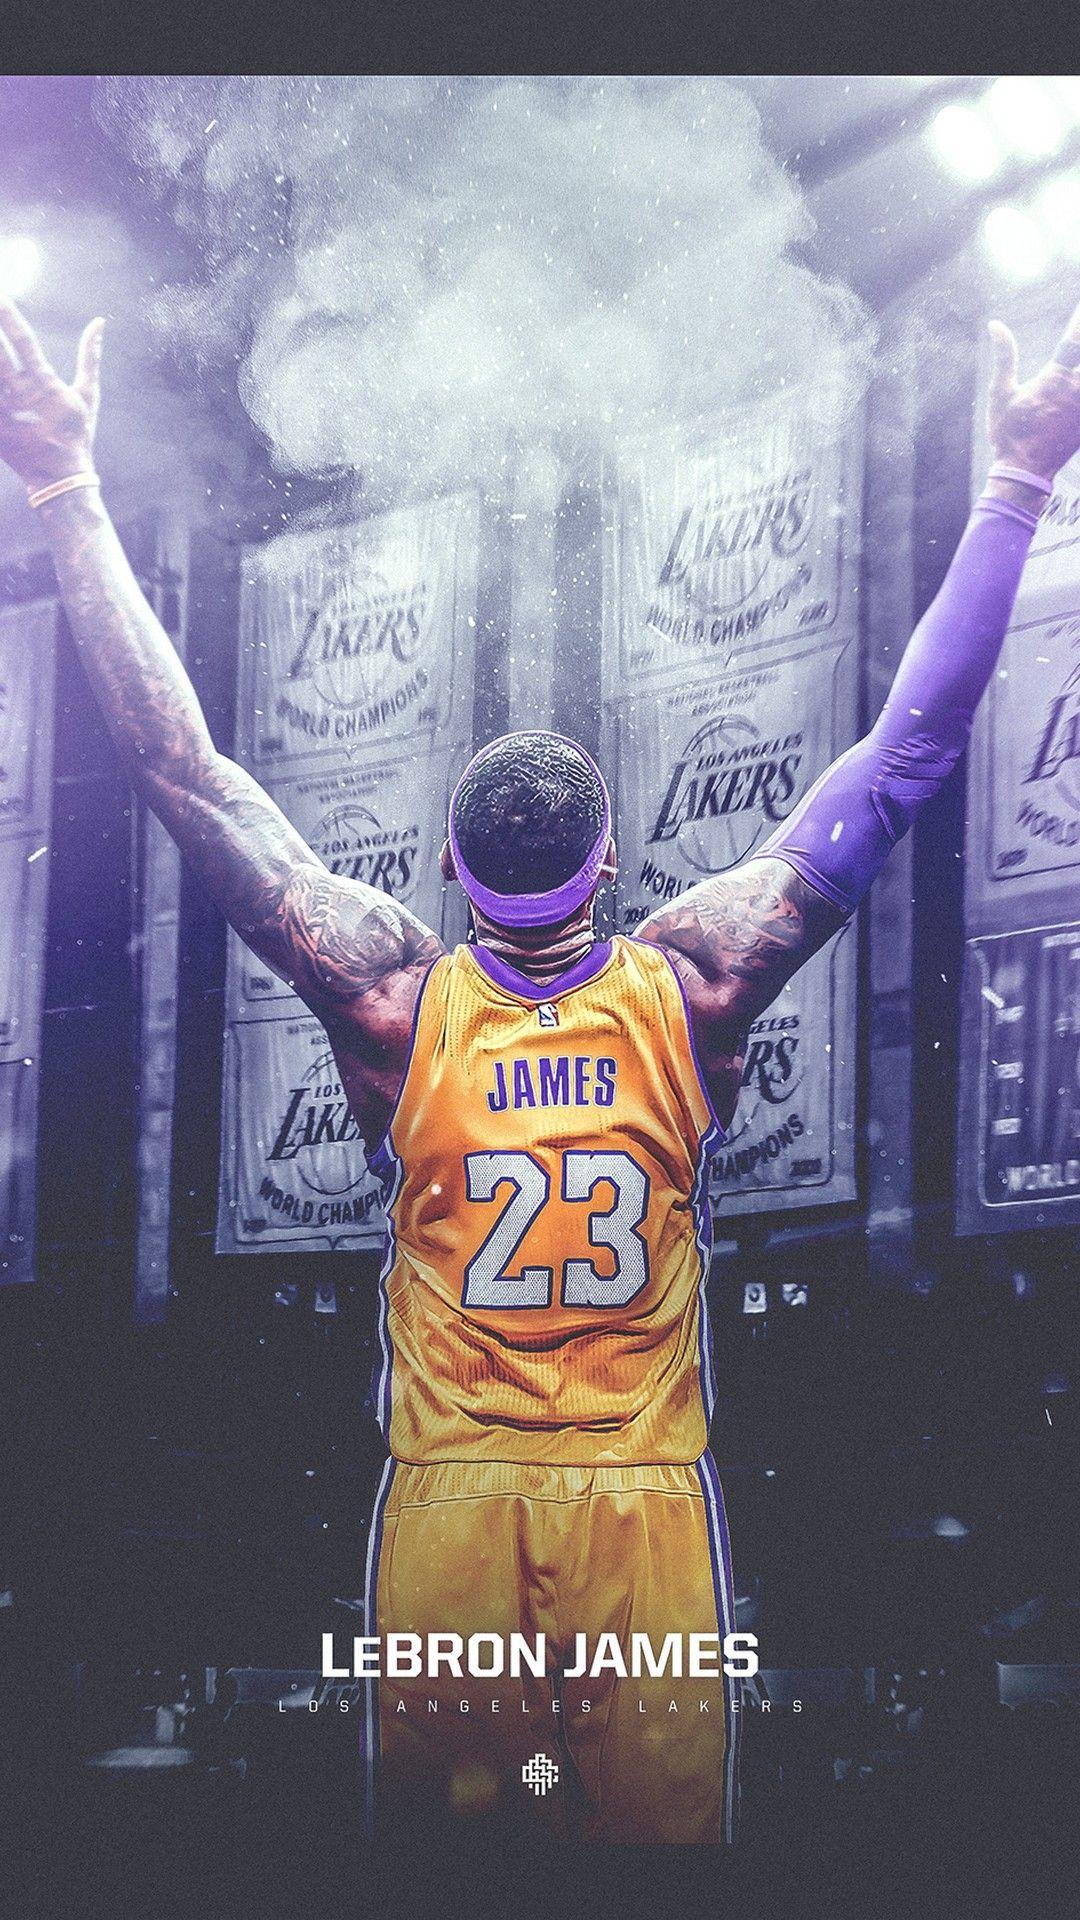 Lebron James La Lakers Hd Wallpaper For Iphone 2021 Basketball Wallpaper Lebron James Poster Basketball Wallpapers Hd Lebron James Wallpapers